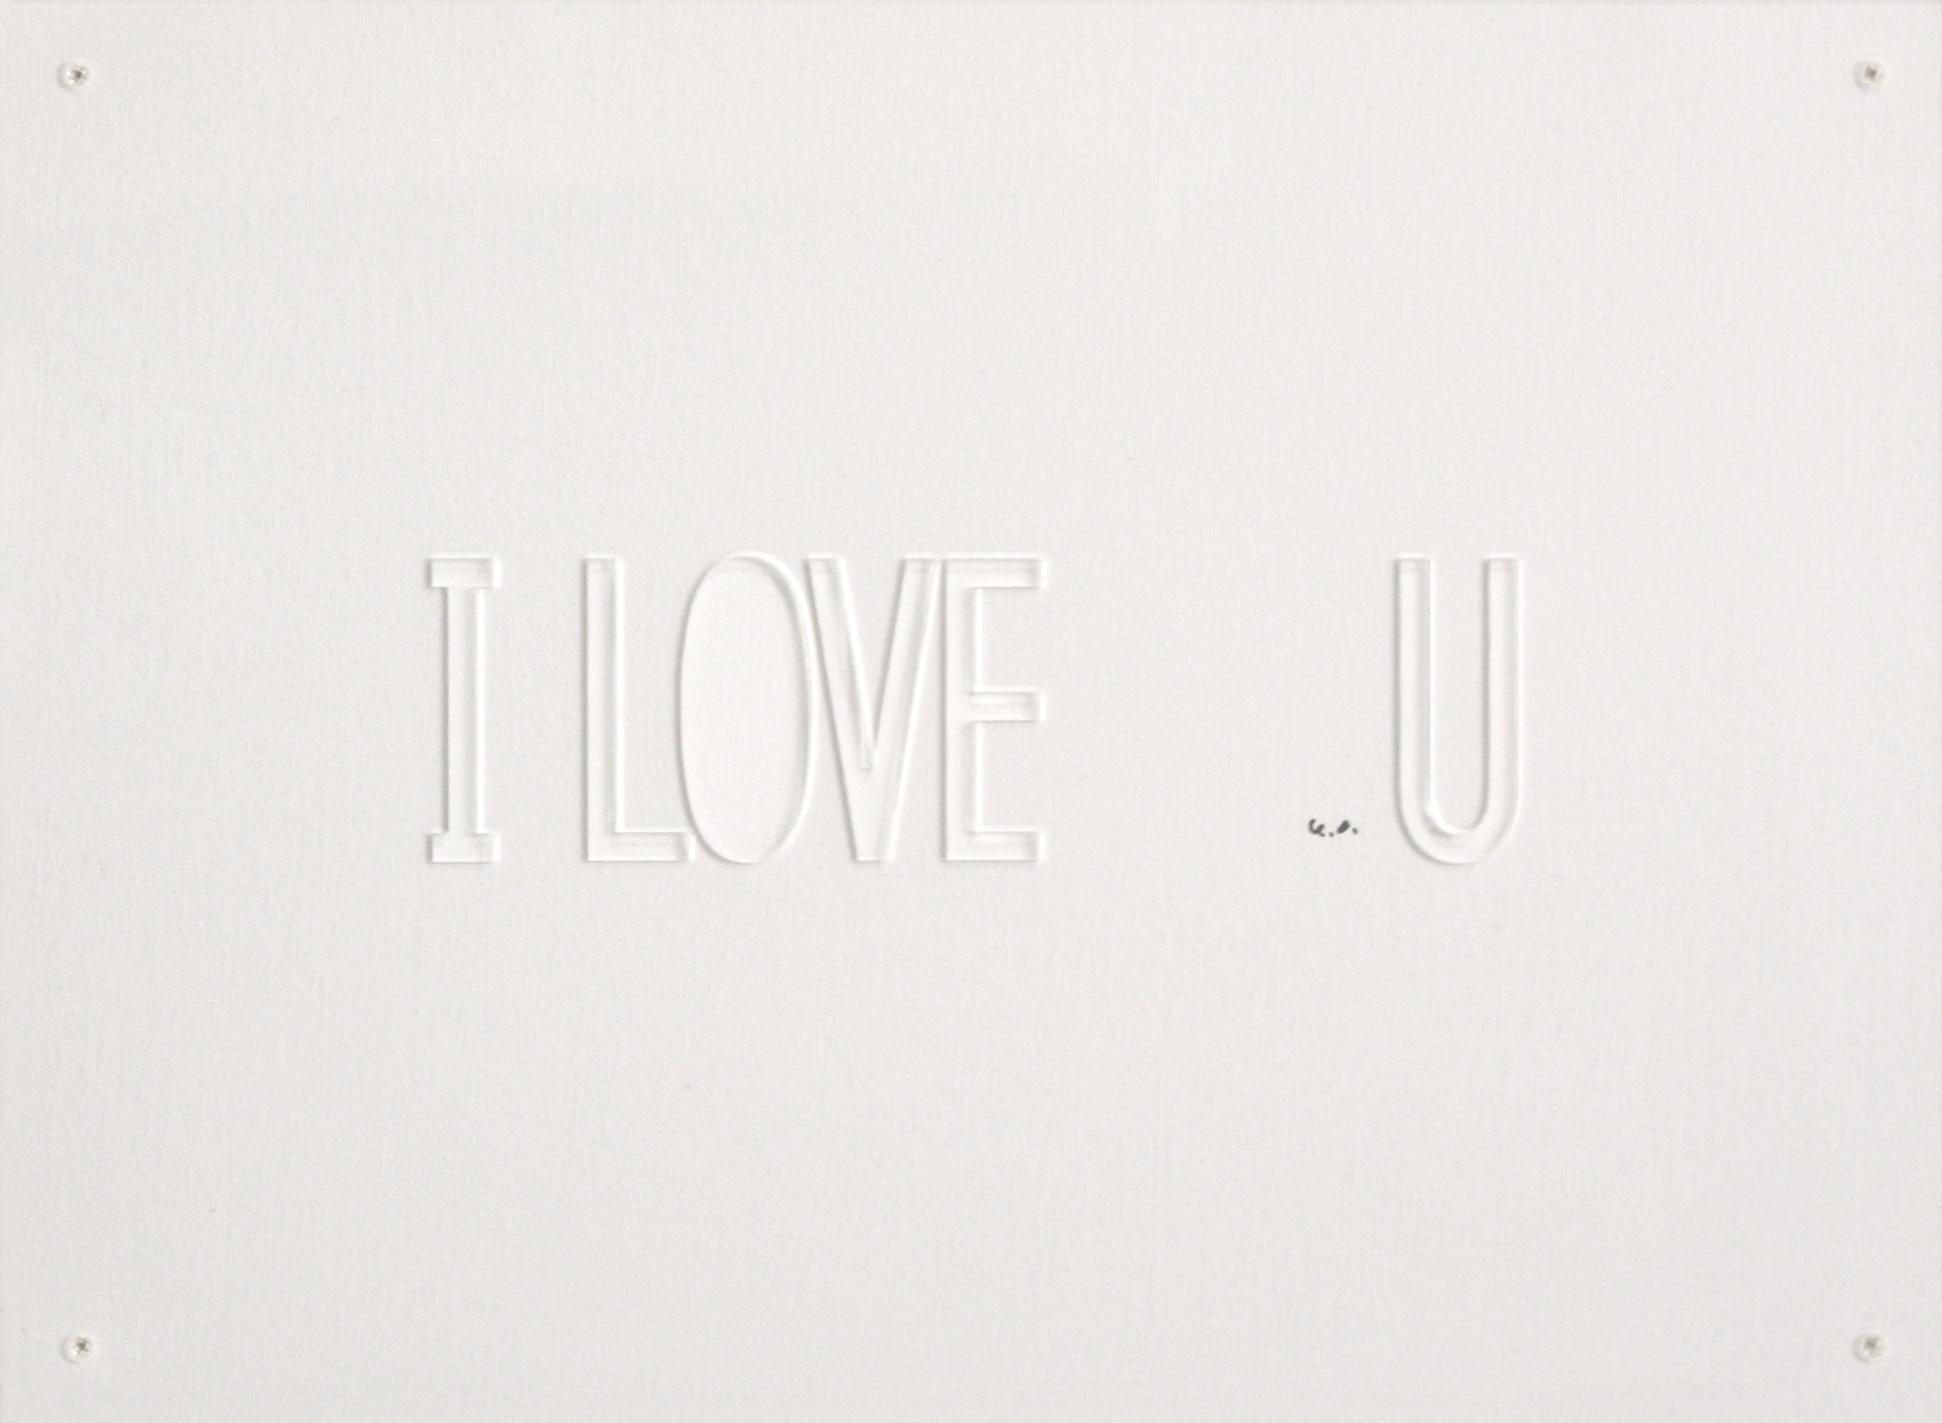 Charitybuzz Add Color I Love U By Yoko Ono Lot 2000103